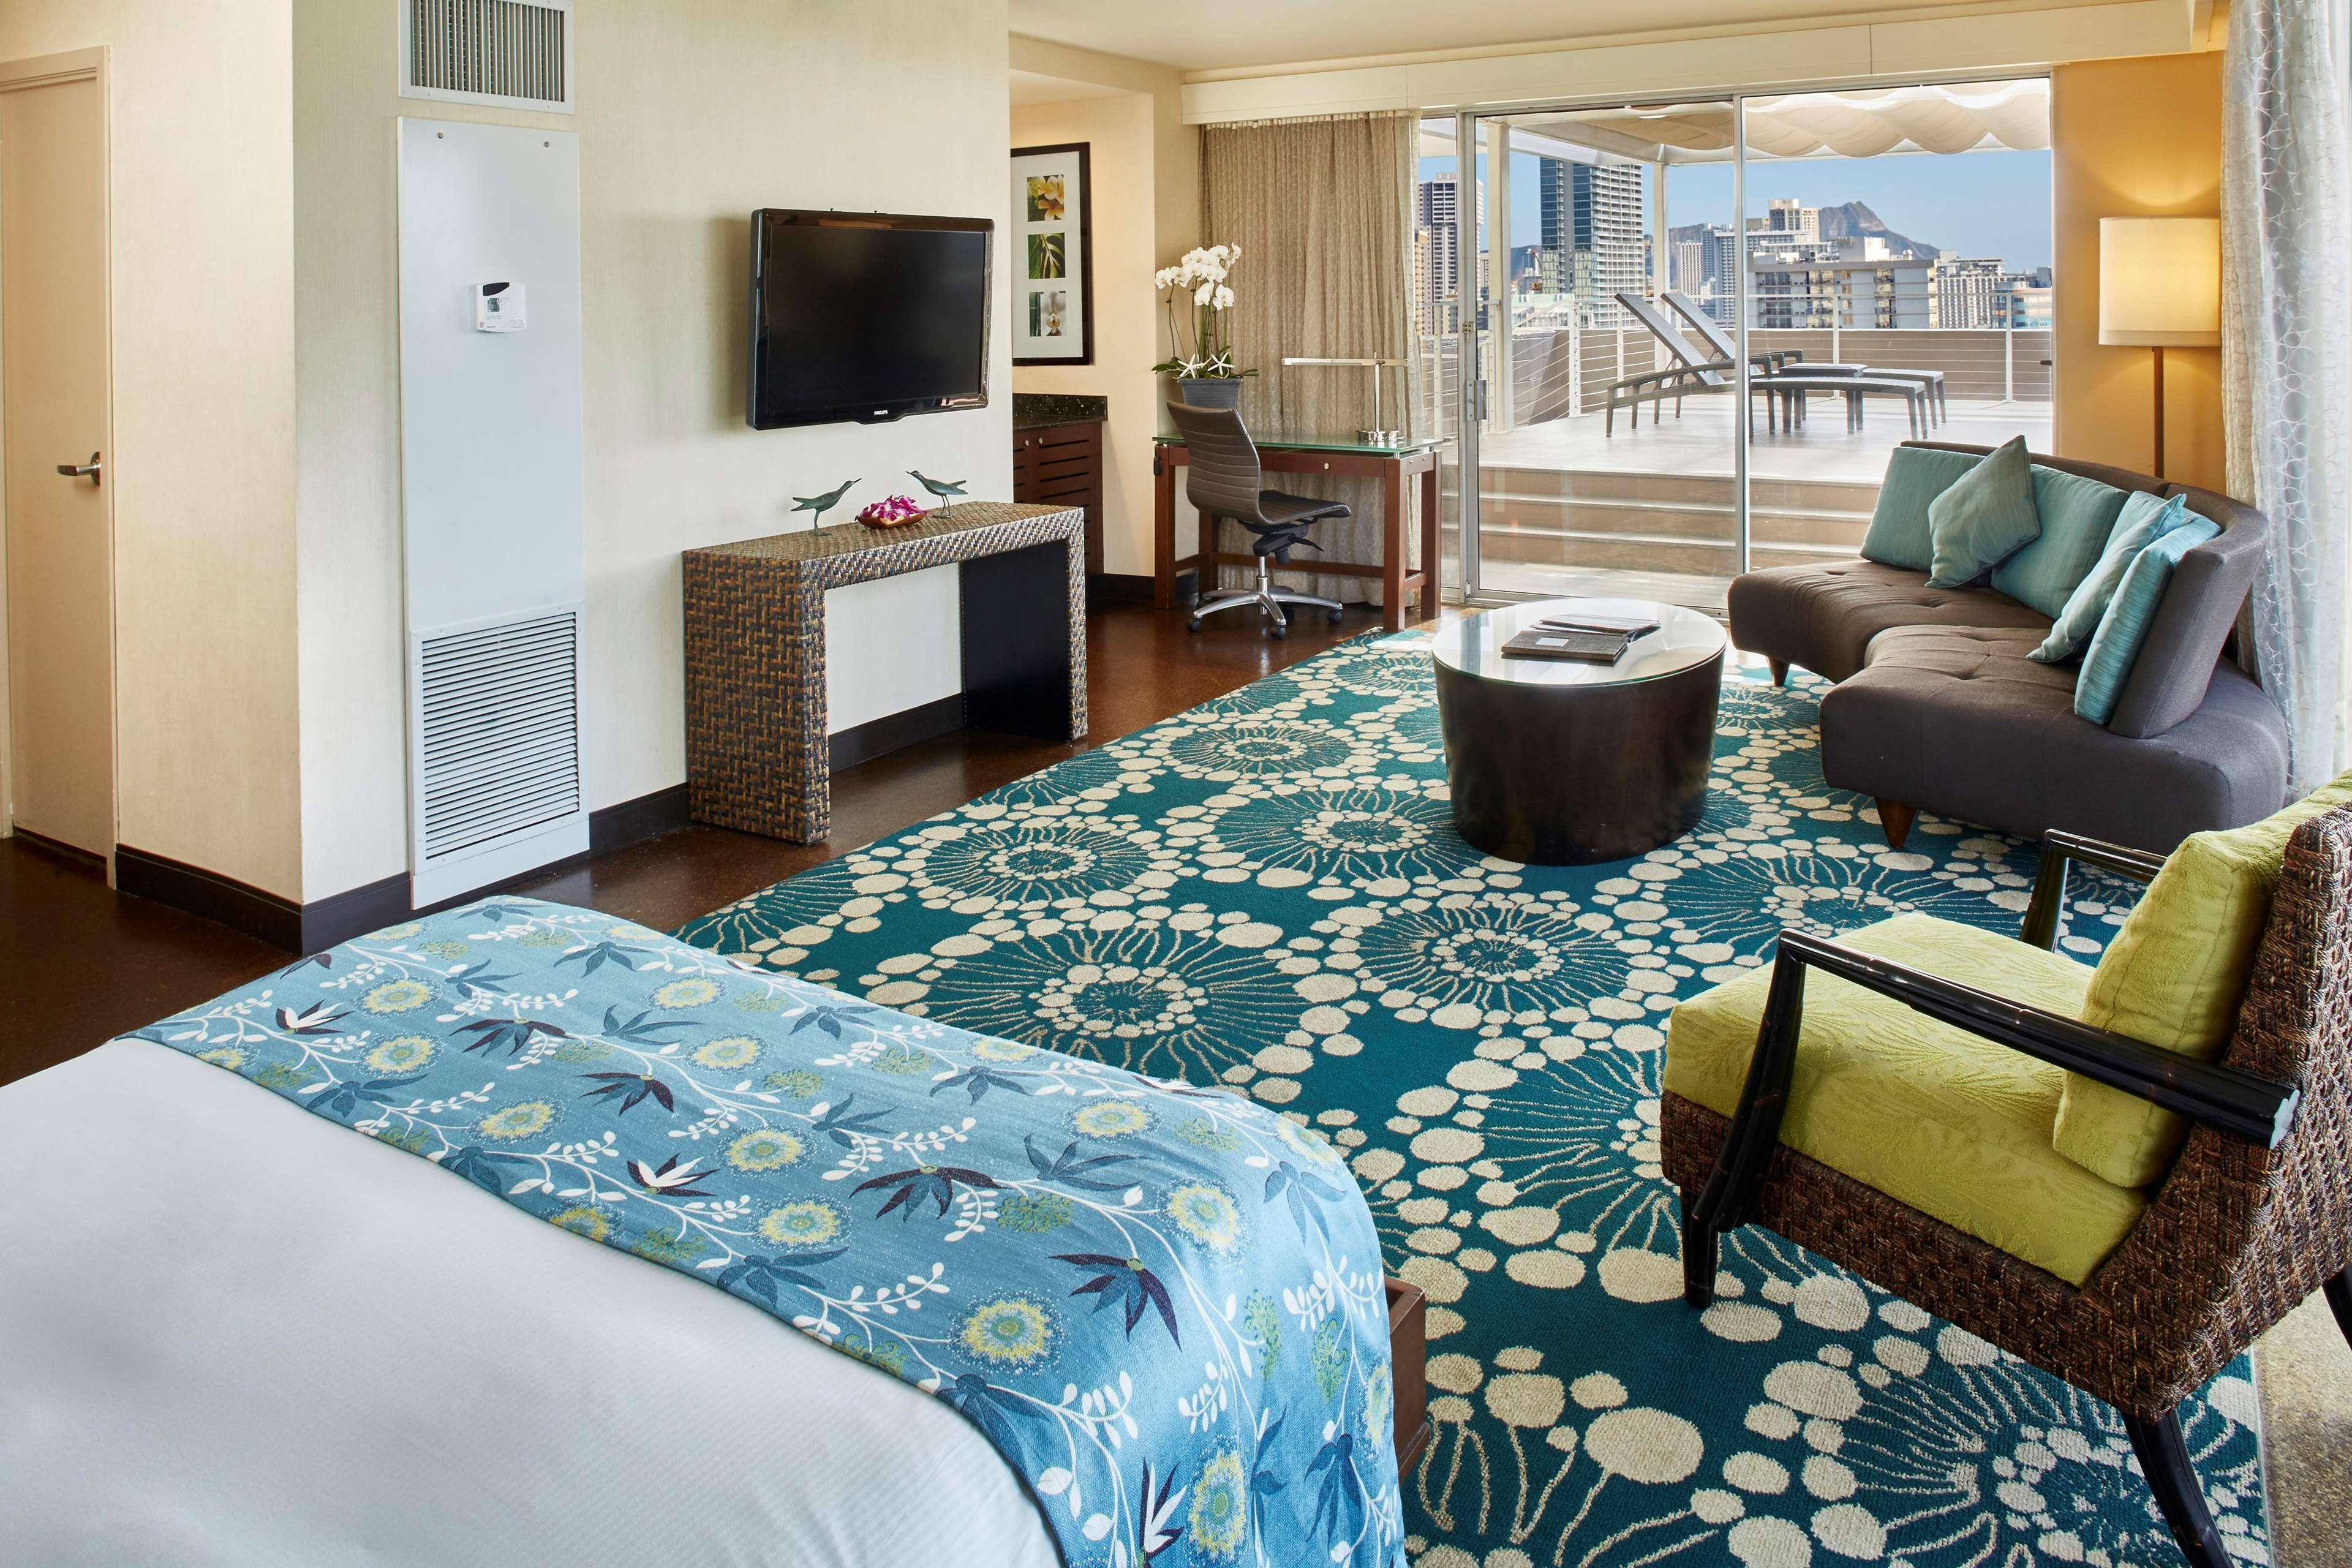 DoubleTree by Hilton Hotel Alana - Waikiki Beach image 18